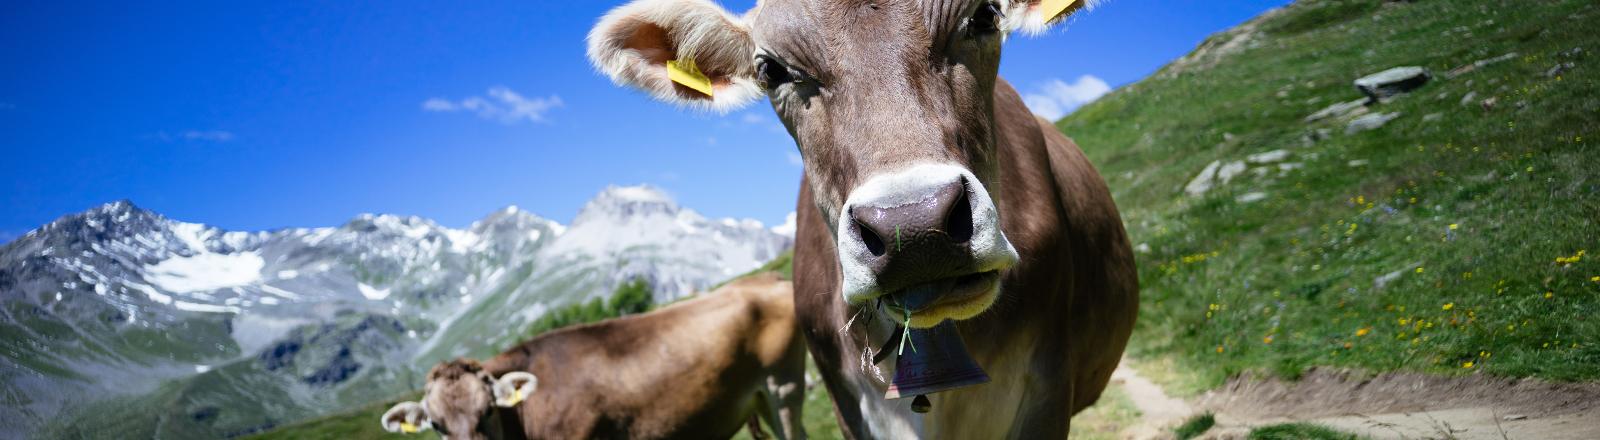 Zwei Kühe. Symbolbild für Superkühe - WDR-Projekt.